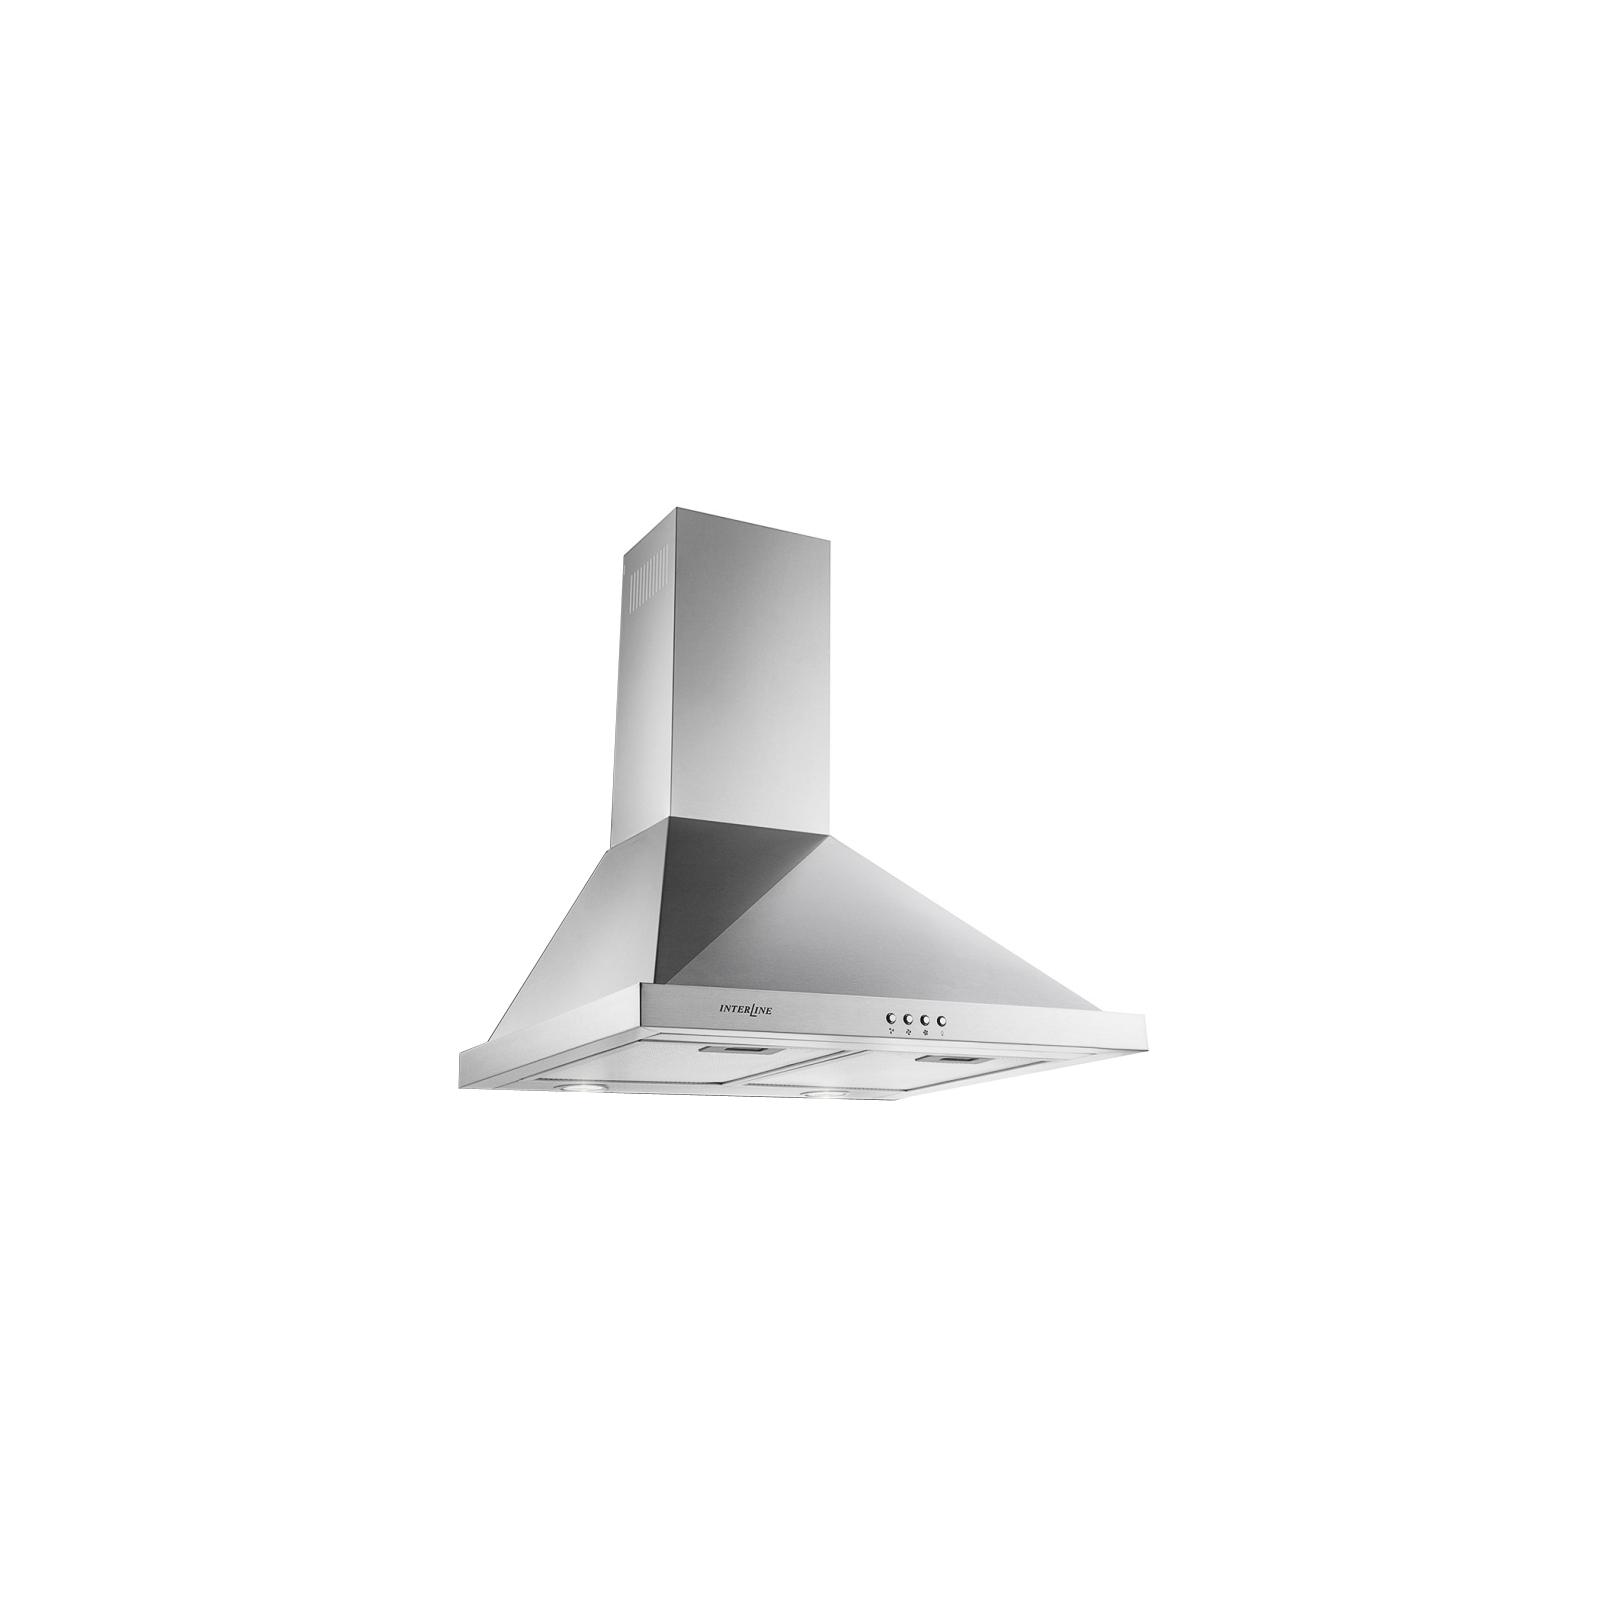 Вытяжка кухонная INTERLINE DONNA LUX X A/60 EB